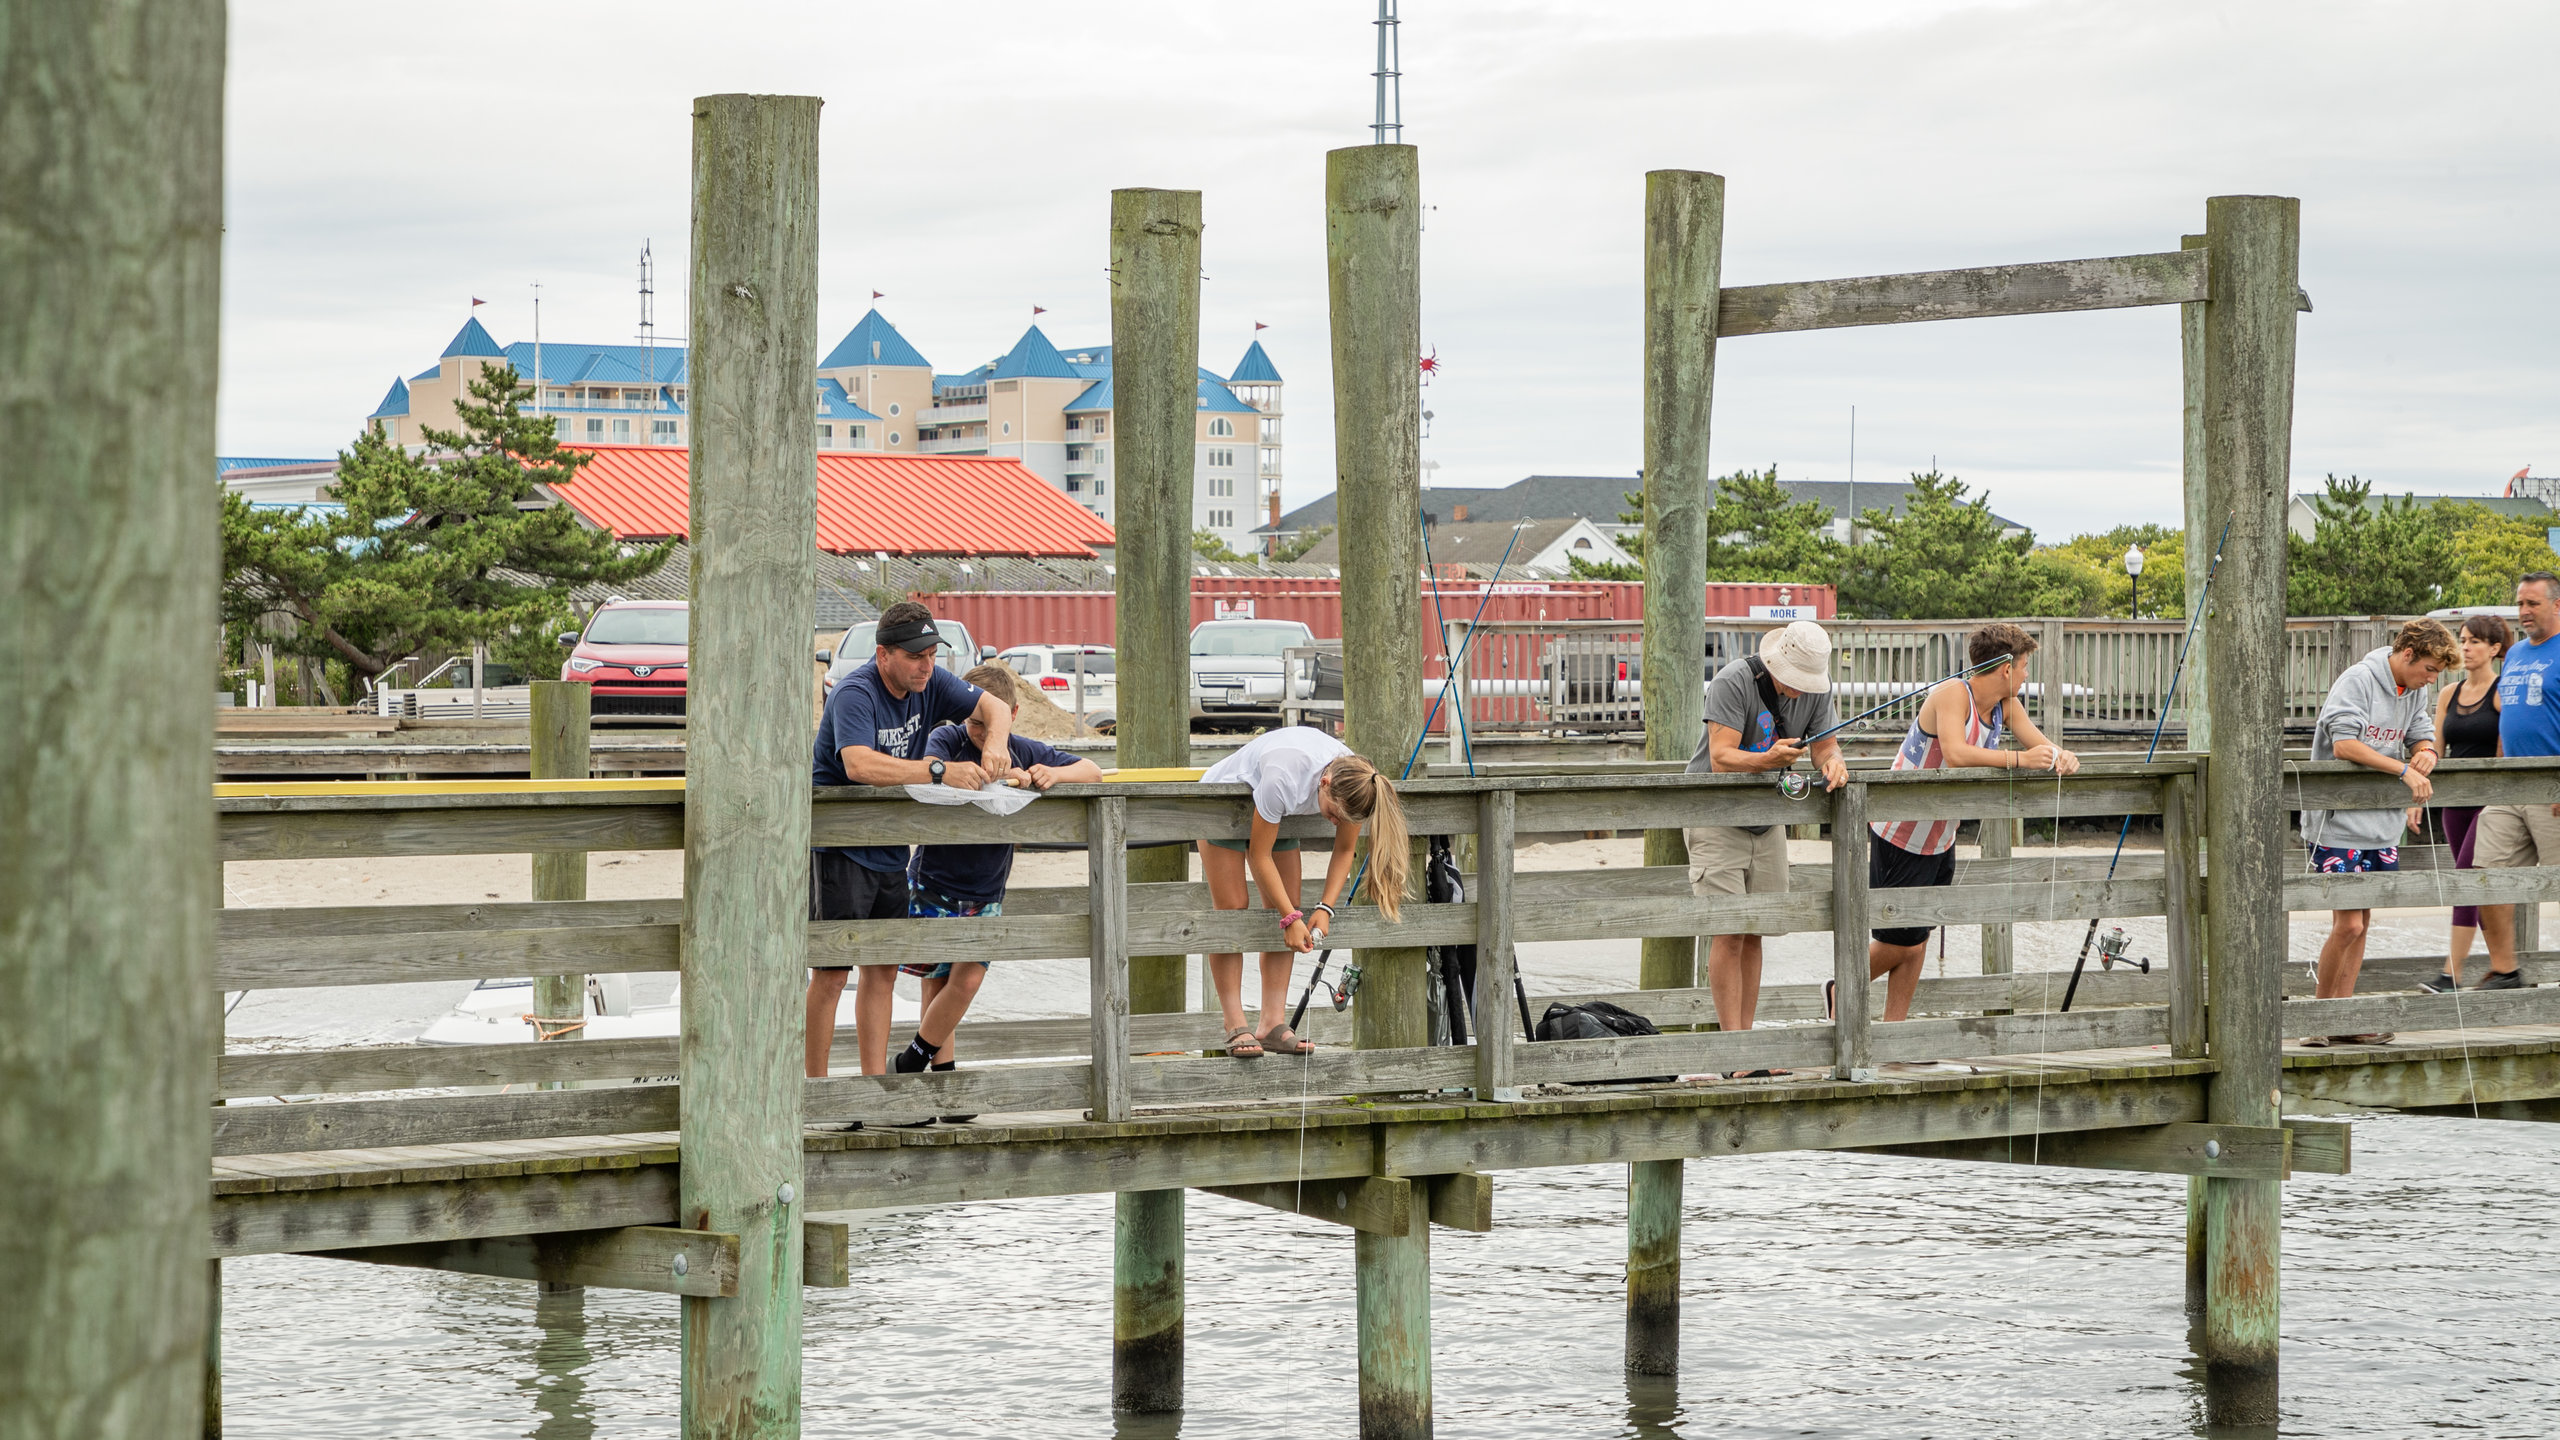 Oceanic Fishing Pier, Ocean City, Maryland, Verenigde Staten